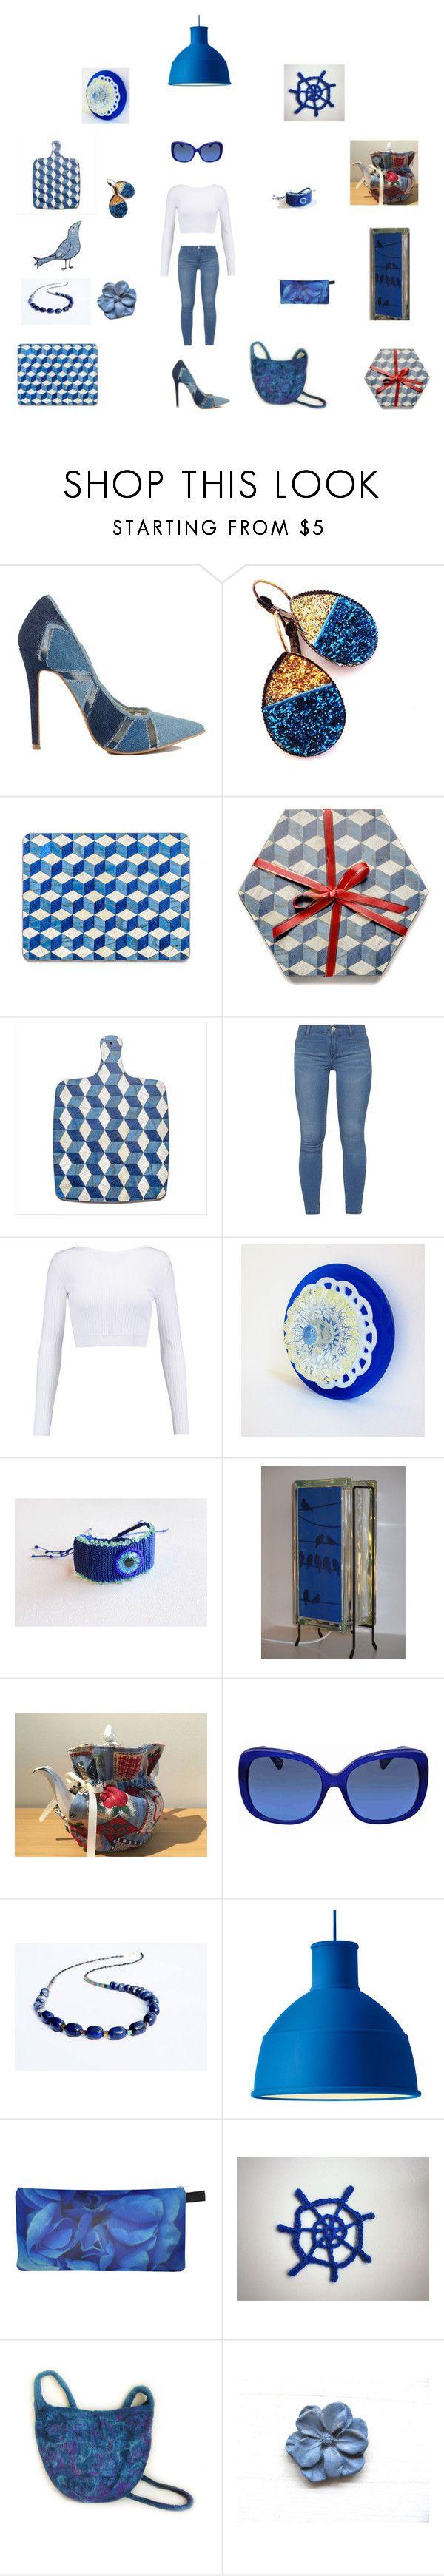 Denim Blues by einder on Polyvore featuring interior, interiors, interior design, home, home decor, interior decorating, Muuto, Cushnie Et Ochs, Dorothy Perkins and Lazuli